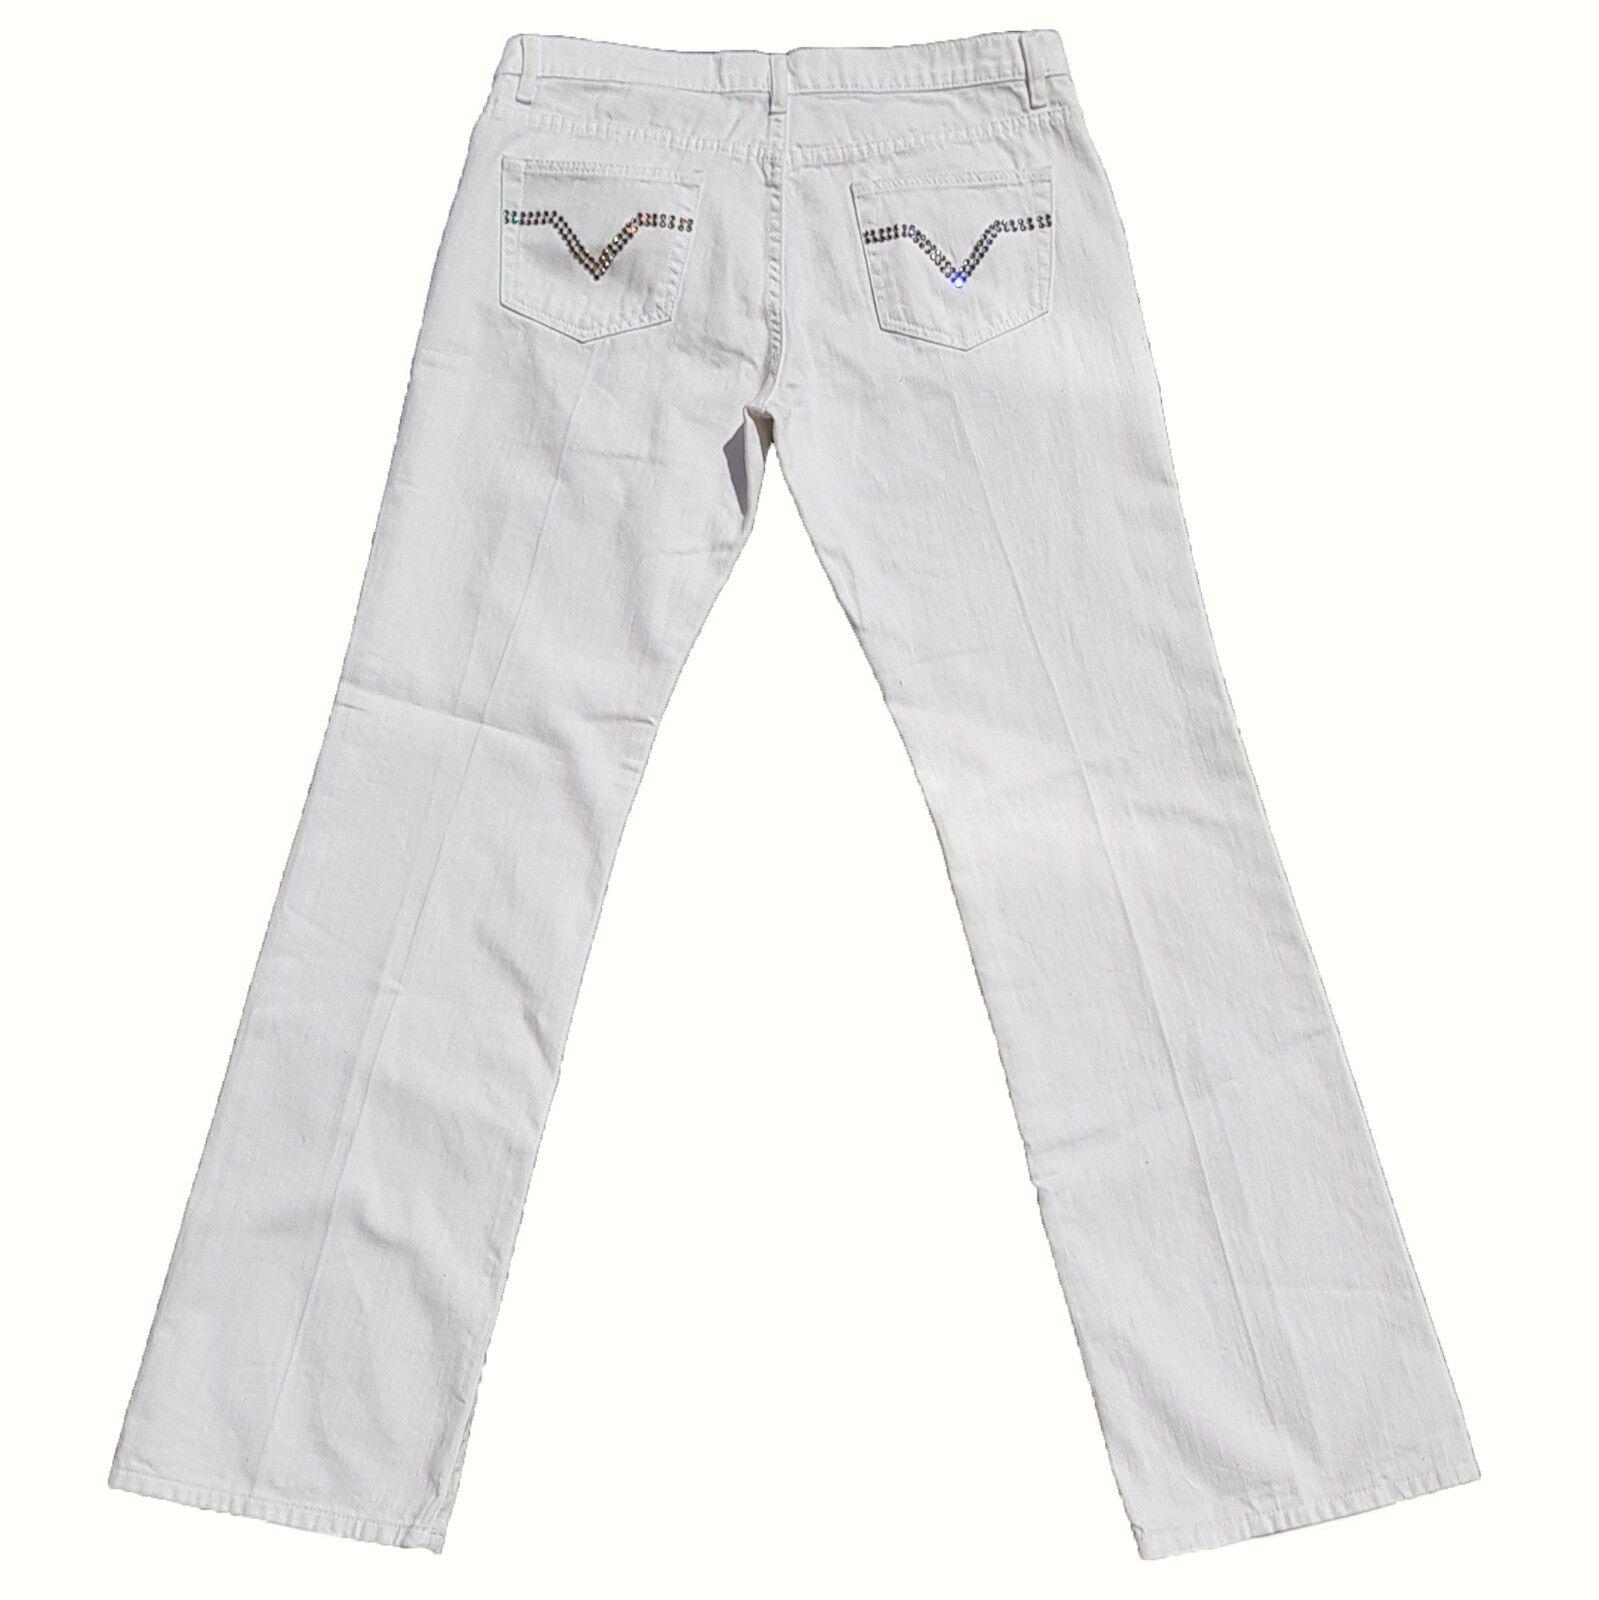 New R.E.D. Valentino Jeans  Größe 32 UK 14 Weiß with Crystal Stud Pockets